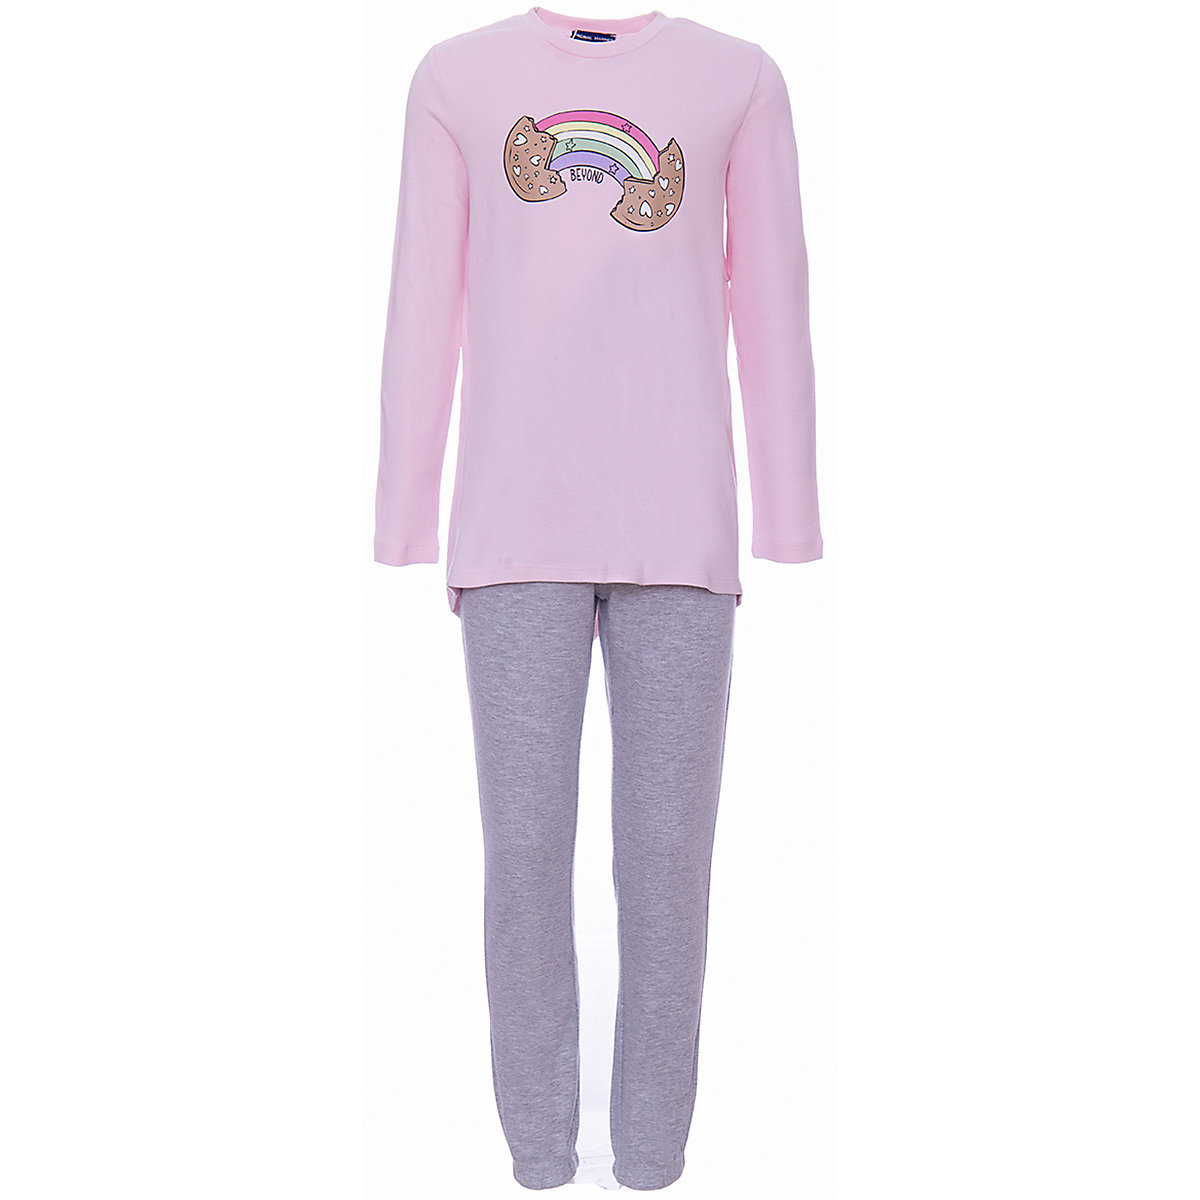 цены ORIGINAL MARINES Pajama Sets 9502075 Cotton Girls childrens clothing Sleepwear Robe MTpromo